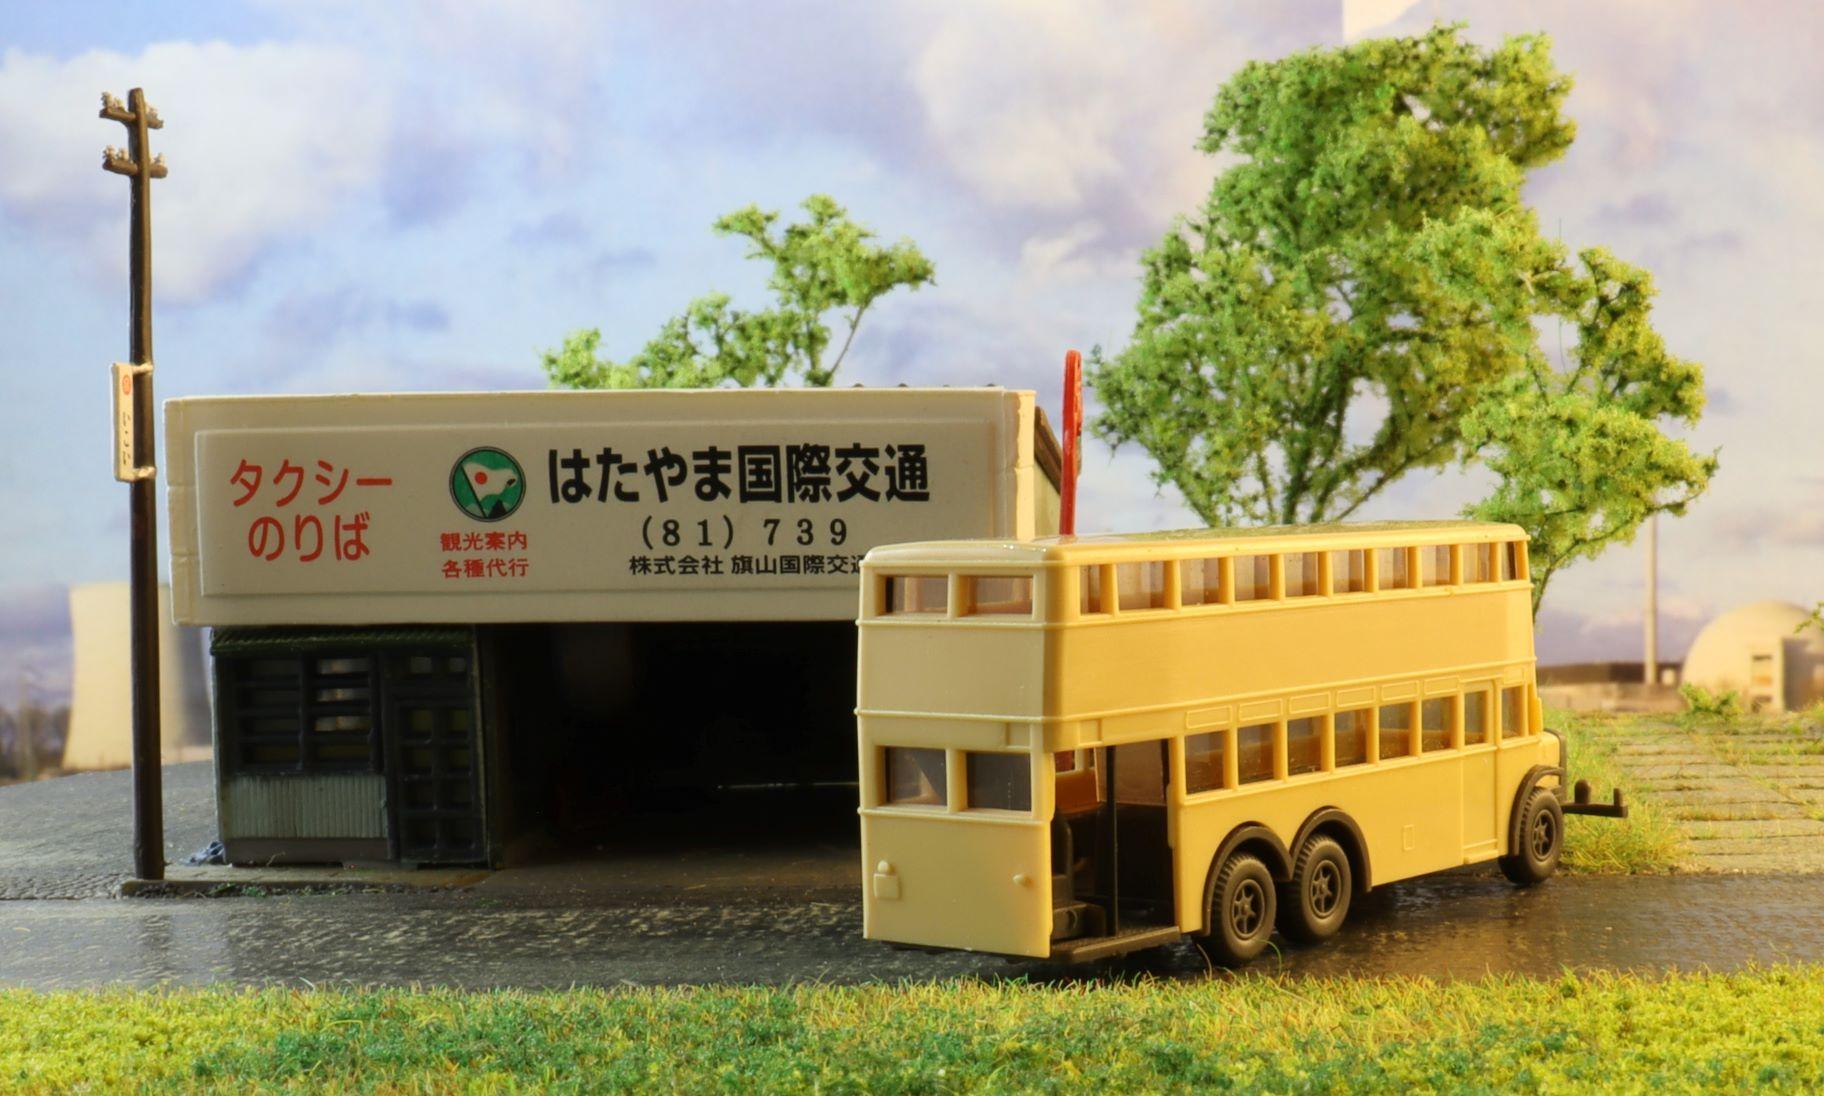 Bussing Autobus  2 .JPG